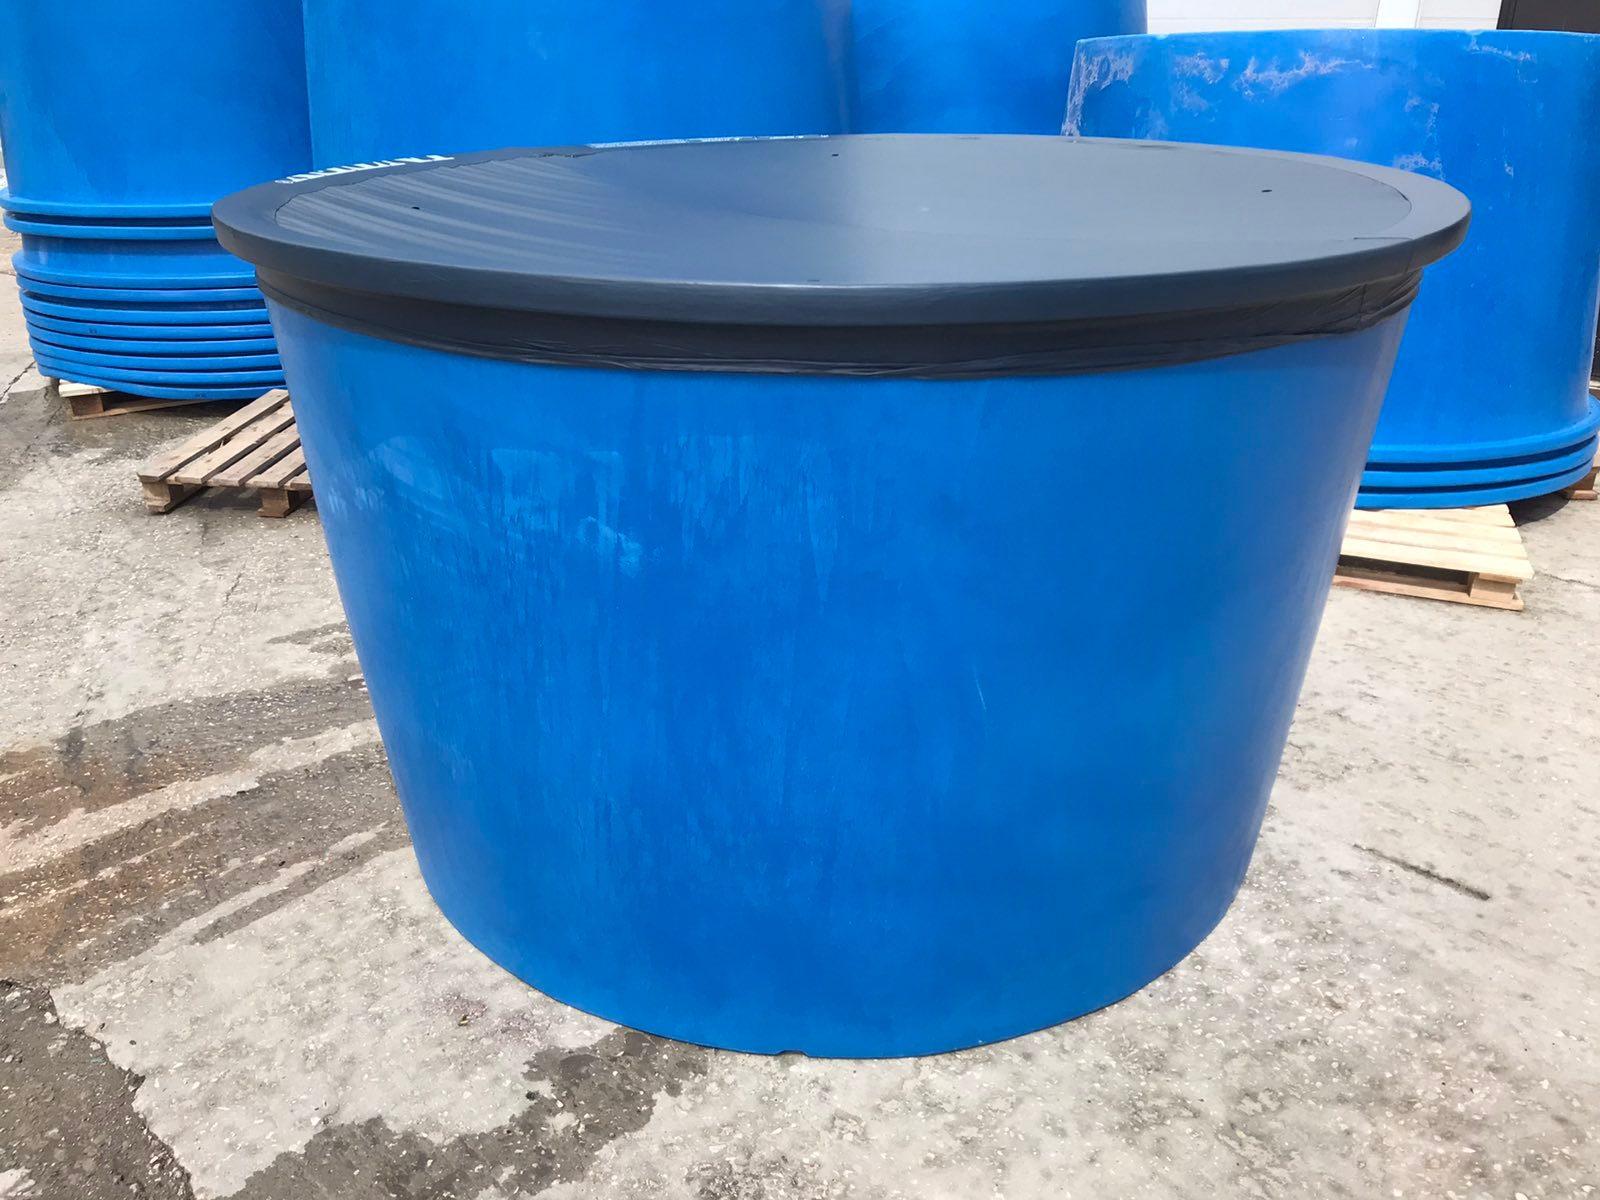 Укрывные тенты для пластиковых бассейнов V3000 V6000